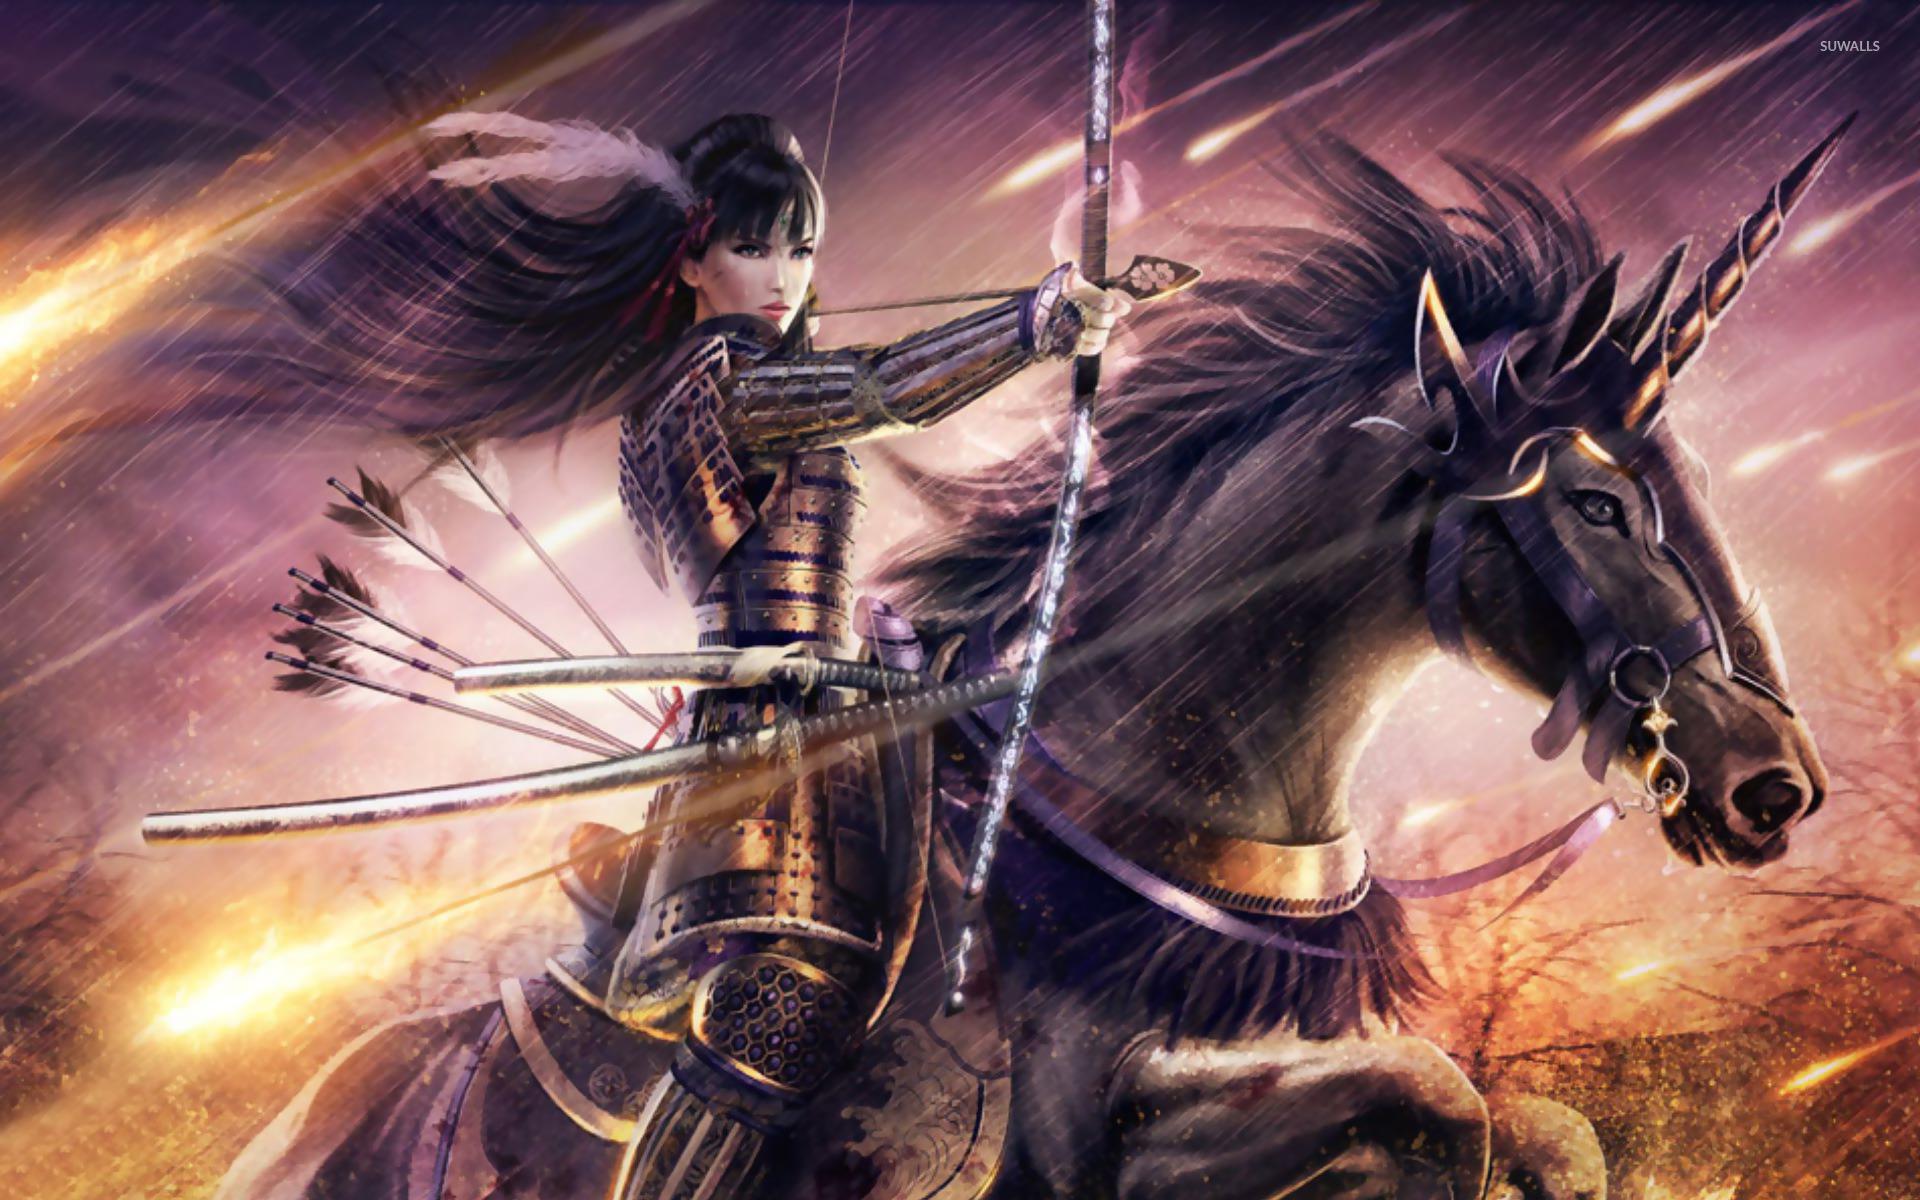 warrior girl wallpaper - fantasy wallpapers - #11732